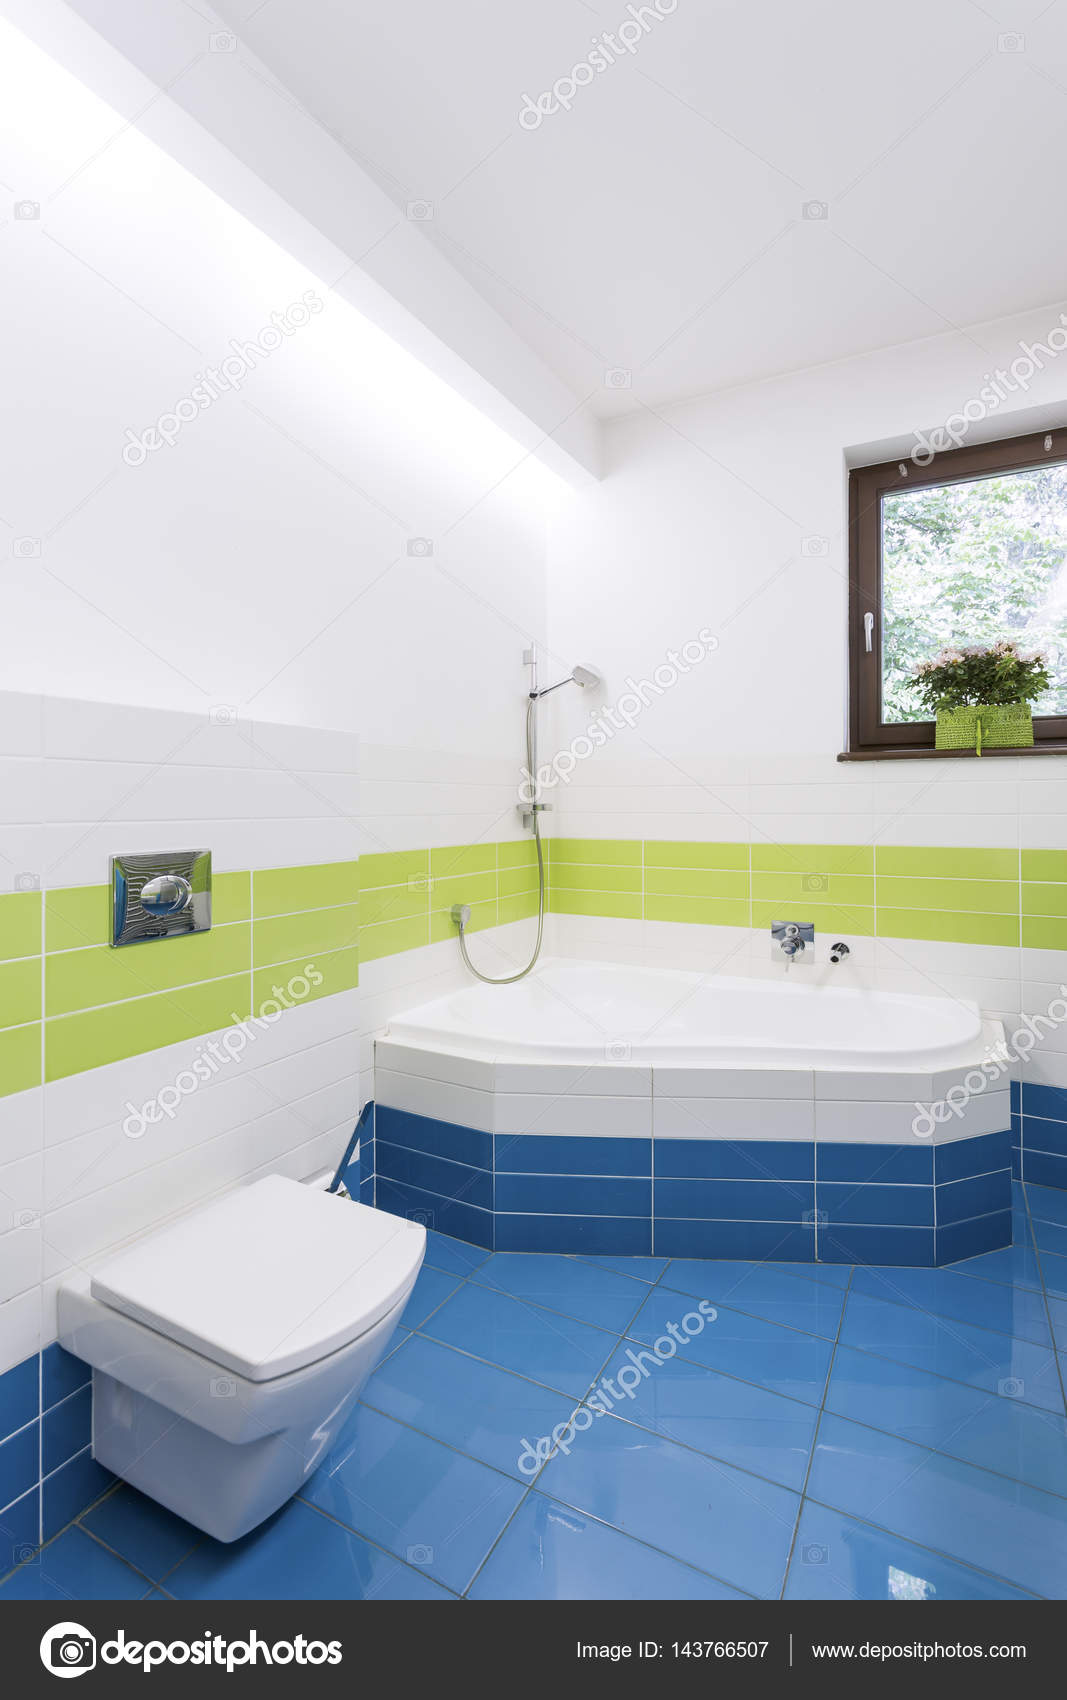 Moderne badkamer met hoekbad — Stockfoto © photographee.eu #143766507